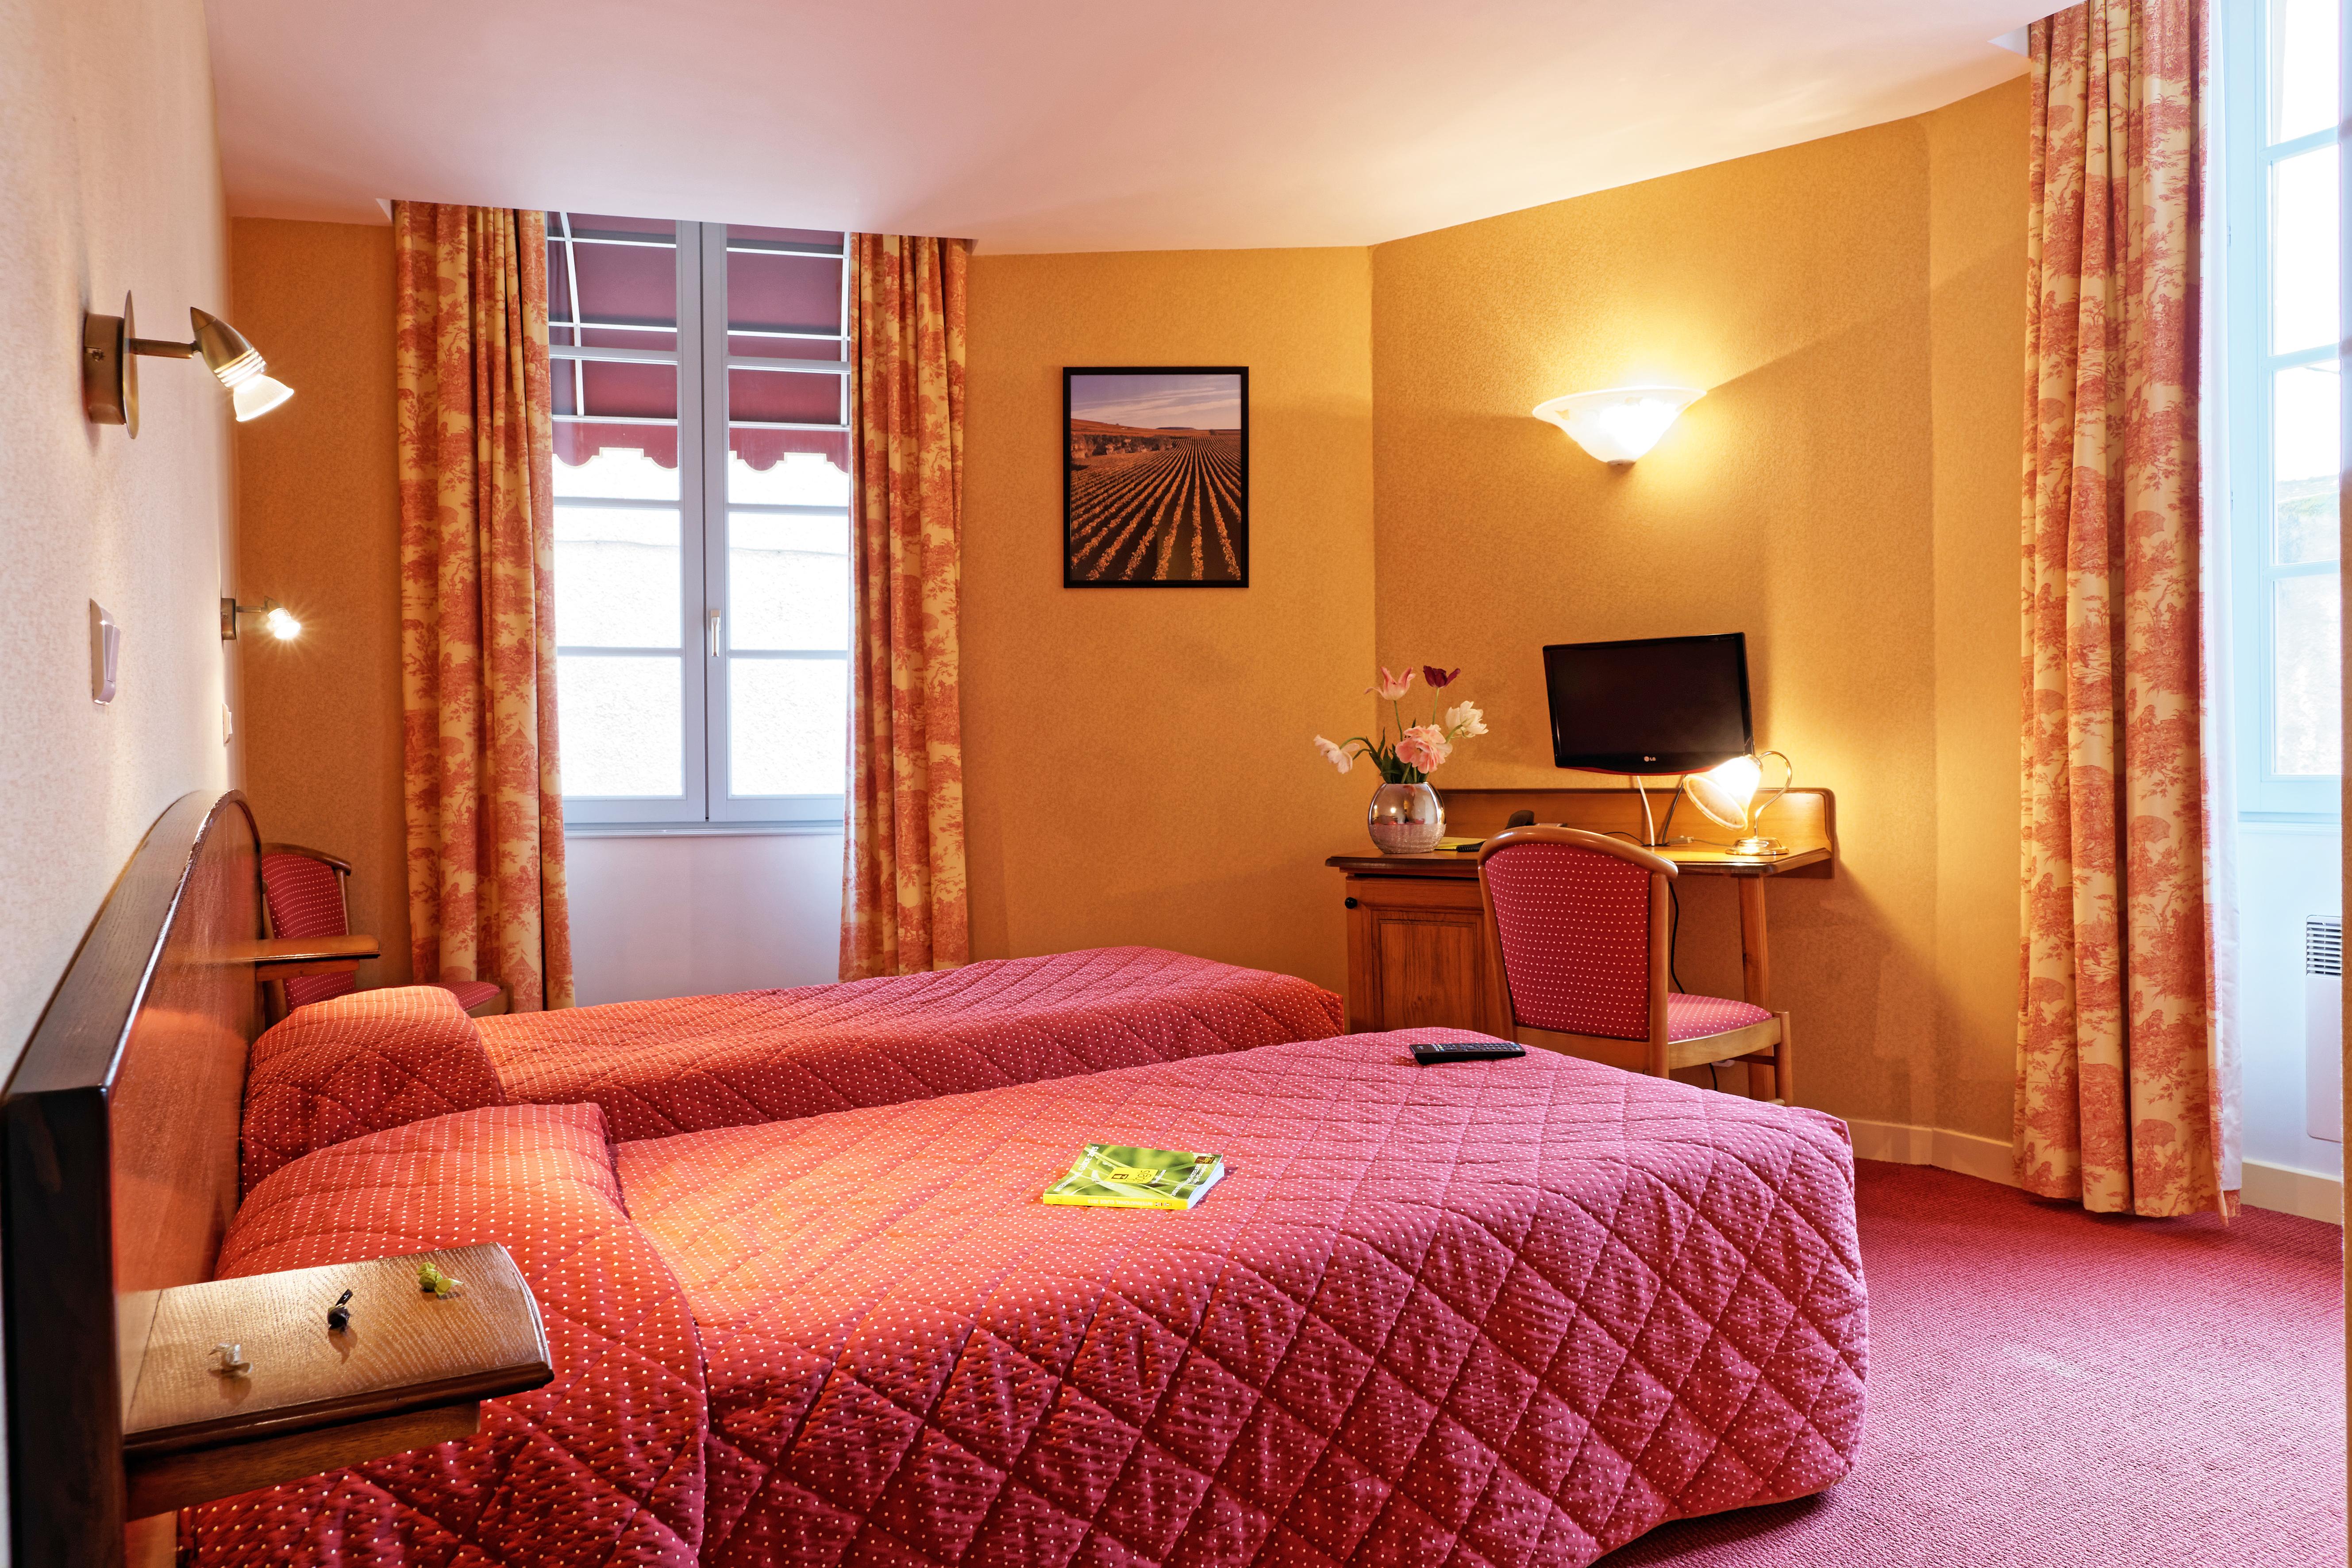 https://www.hotel-restaurant-trois-maures.fr/wp-content/uploads/2015/10/DSC05205_DxO1.jpg